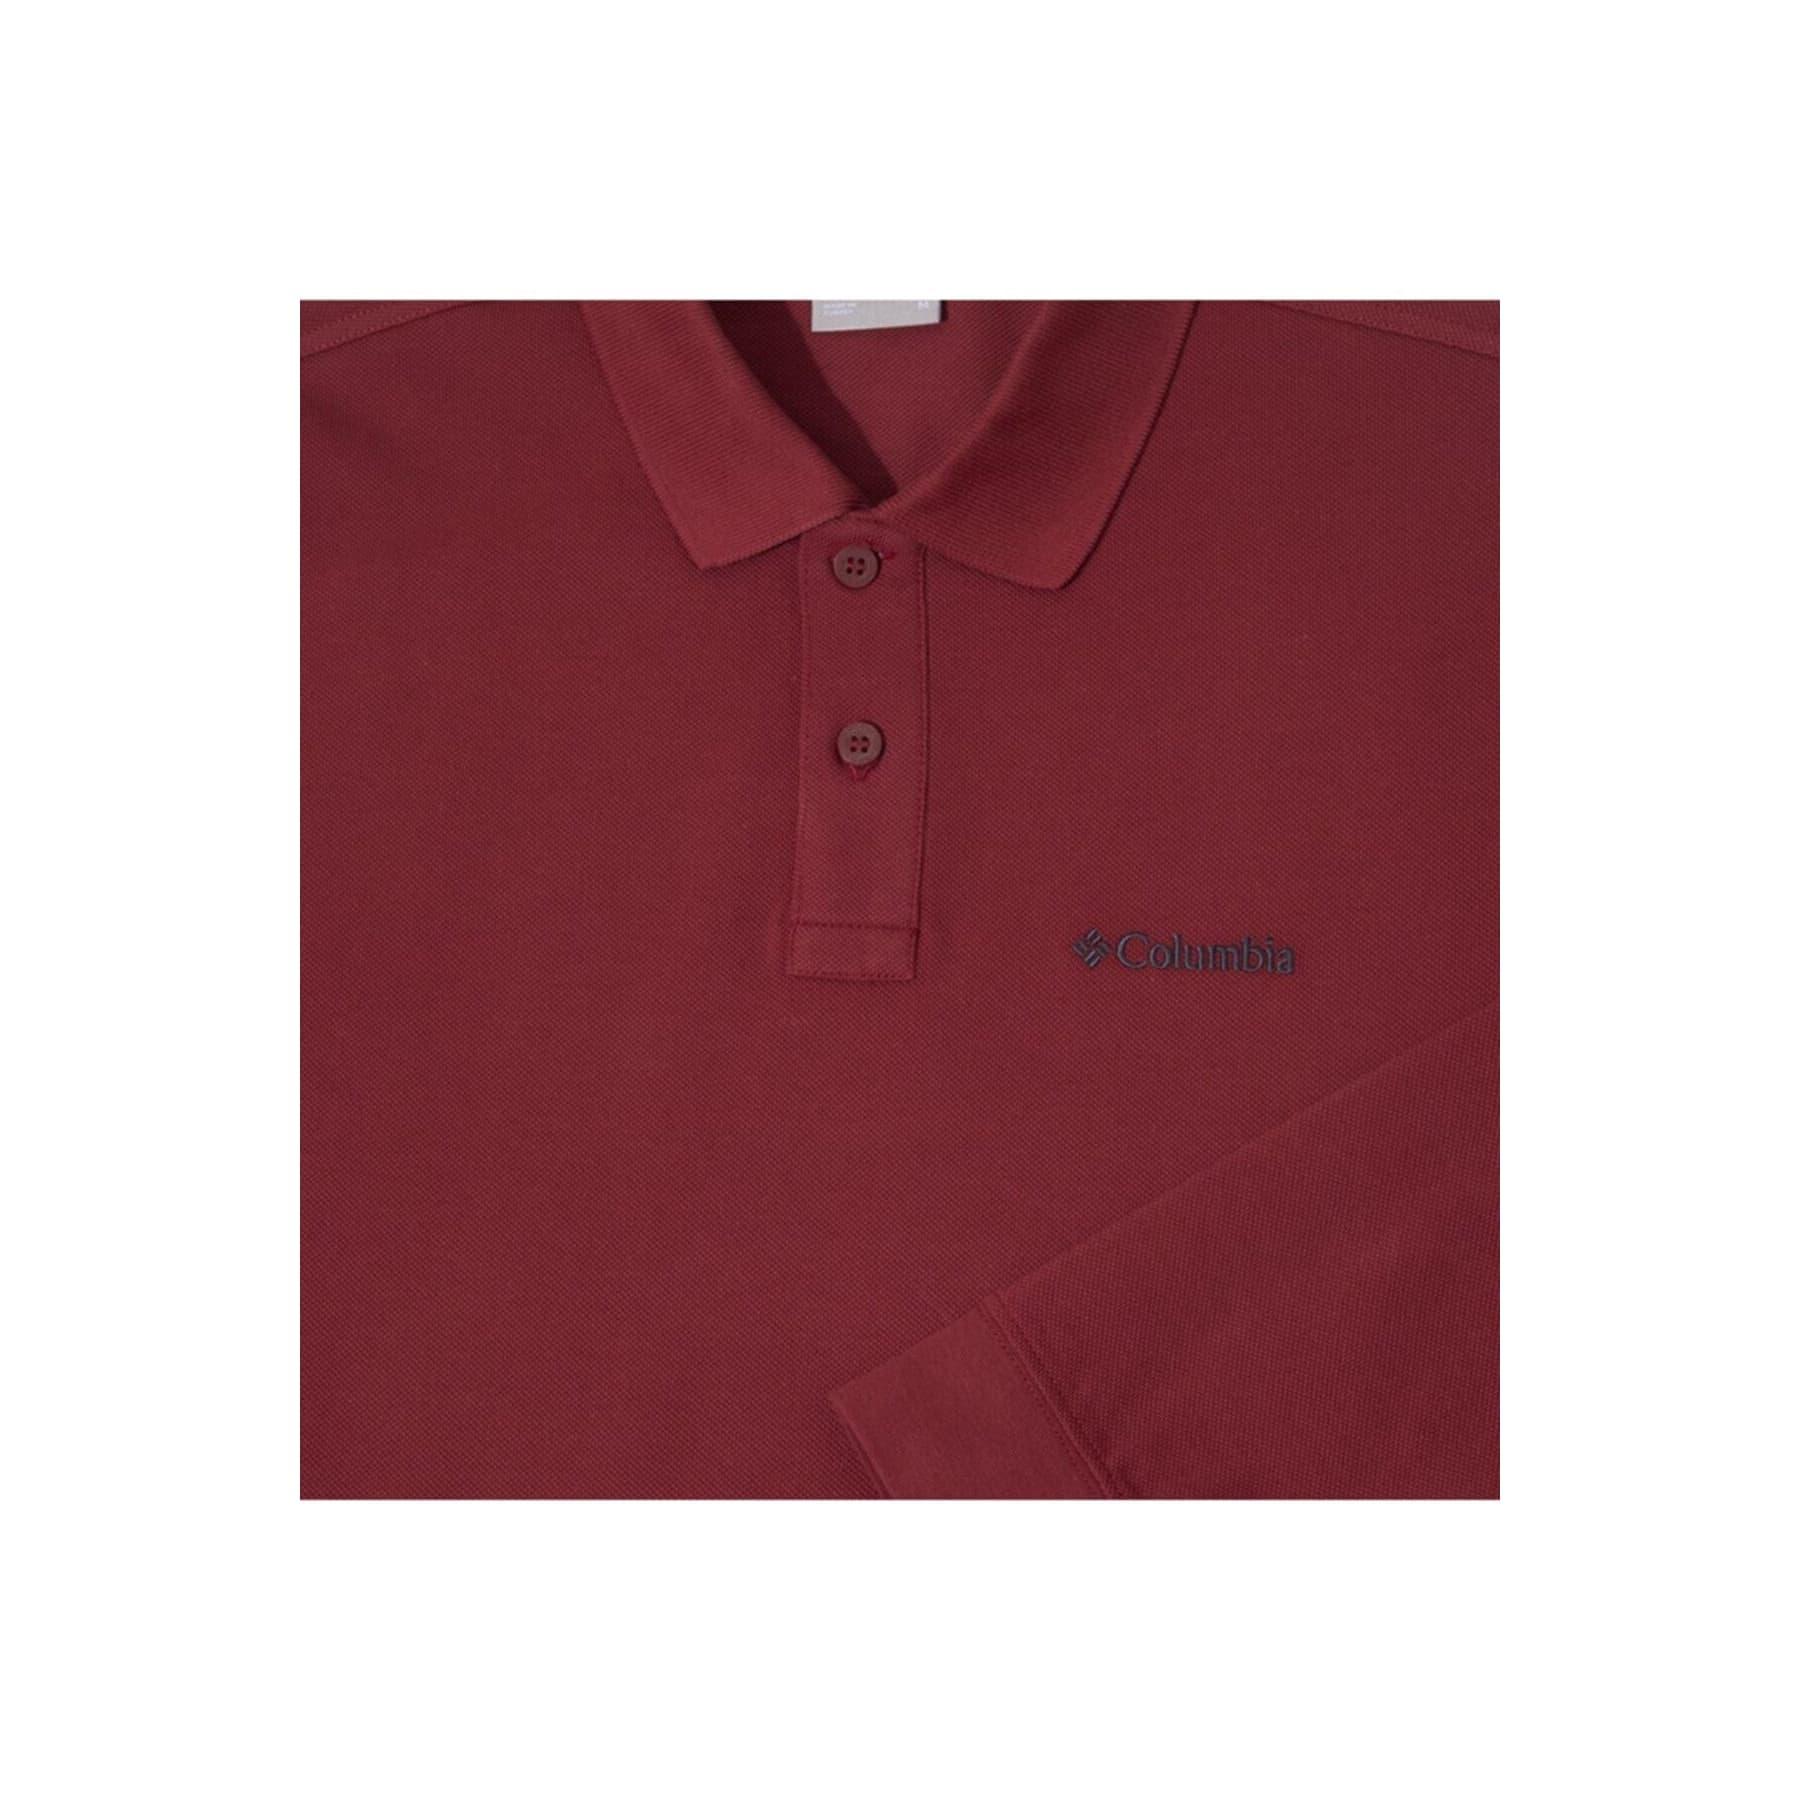 Cascade Range Solid Ls Erkek Tişört (CS0099 - 678)